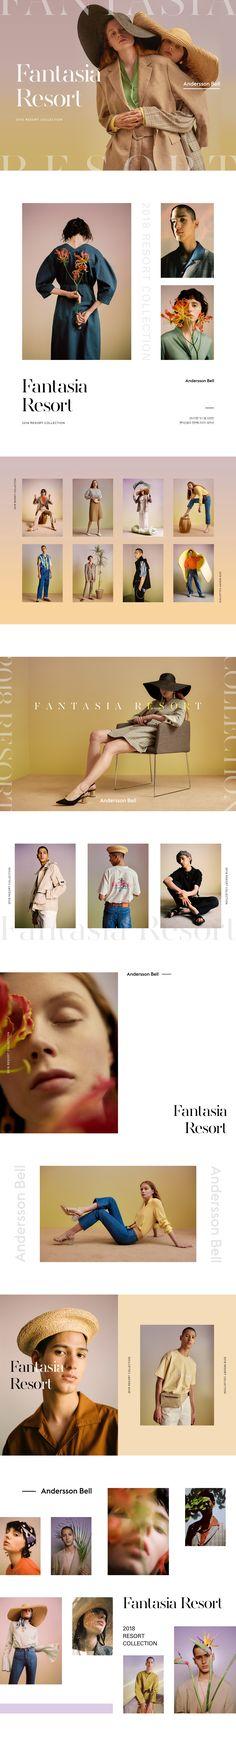 fashion background W , Website Design Layout, Homepage Design, Web Layout, Layout Design, Lookbook Layout, Lookbook Design, Fashion Web Design, Creer Un Site Web, Email Design Inspiration